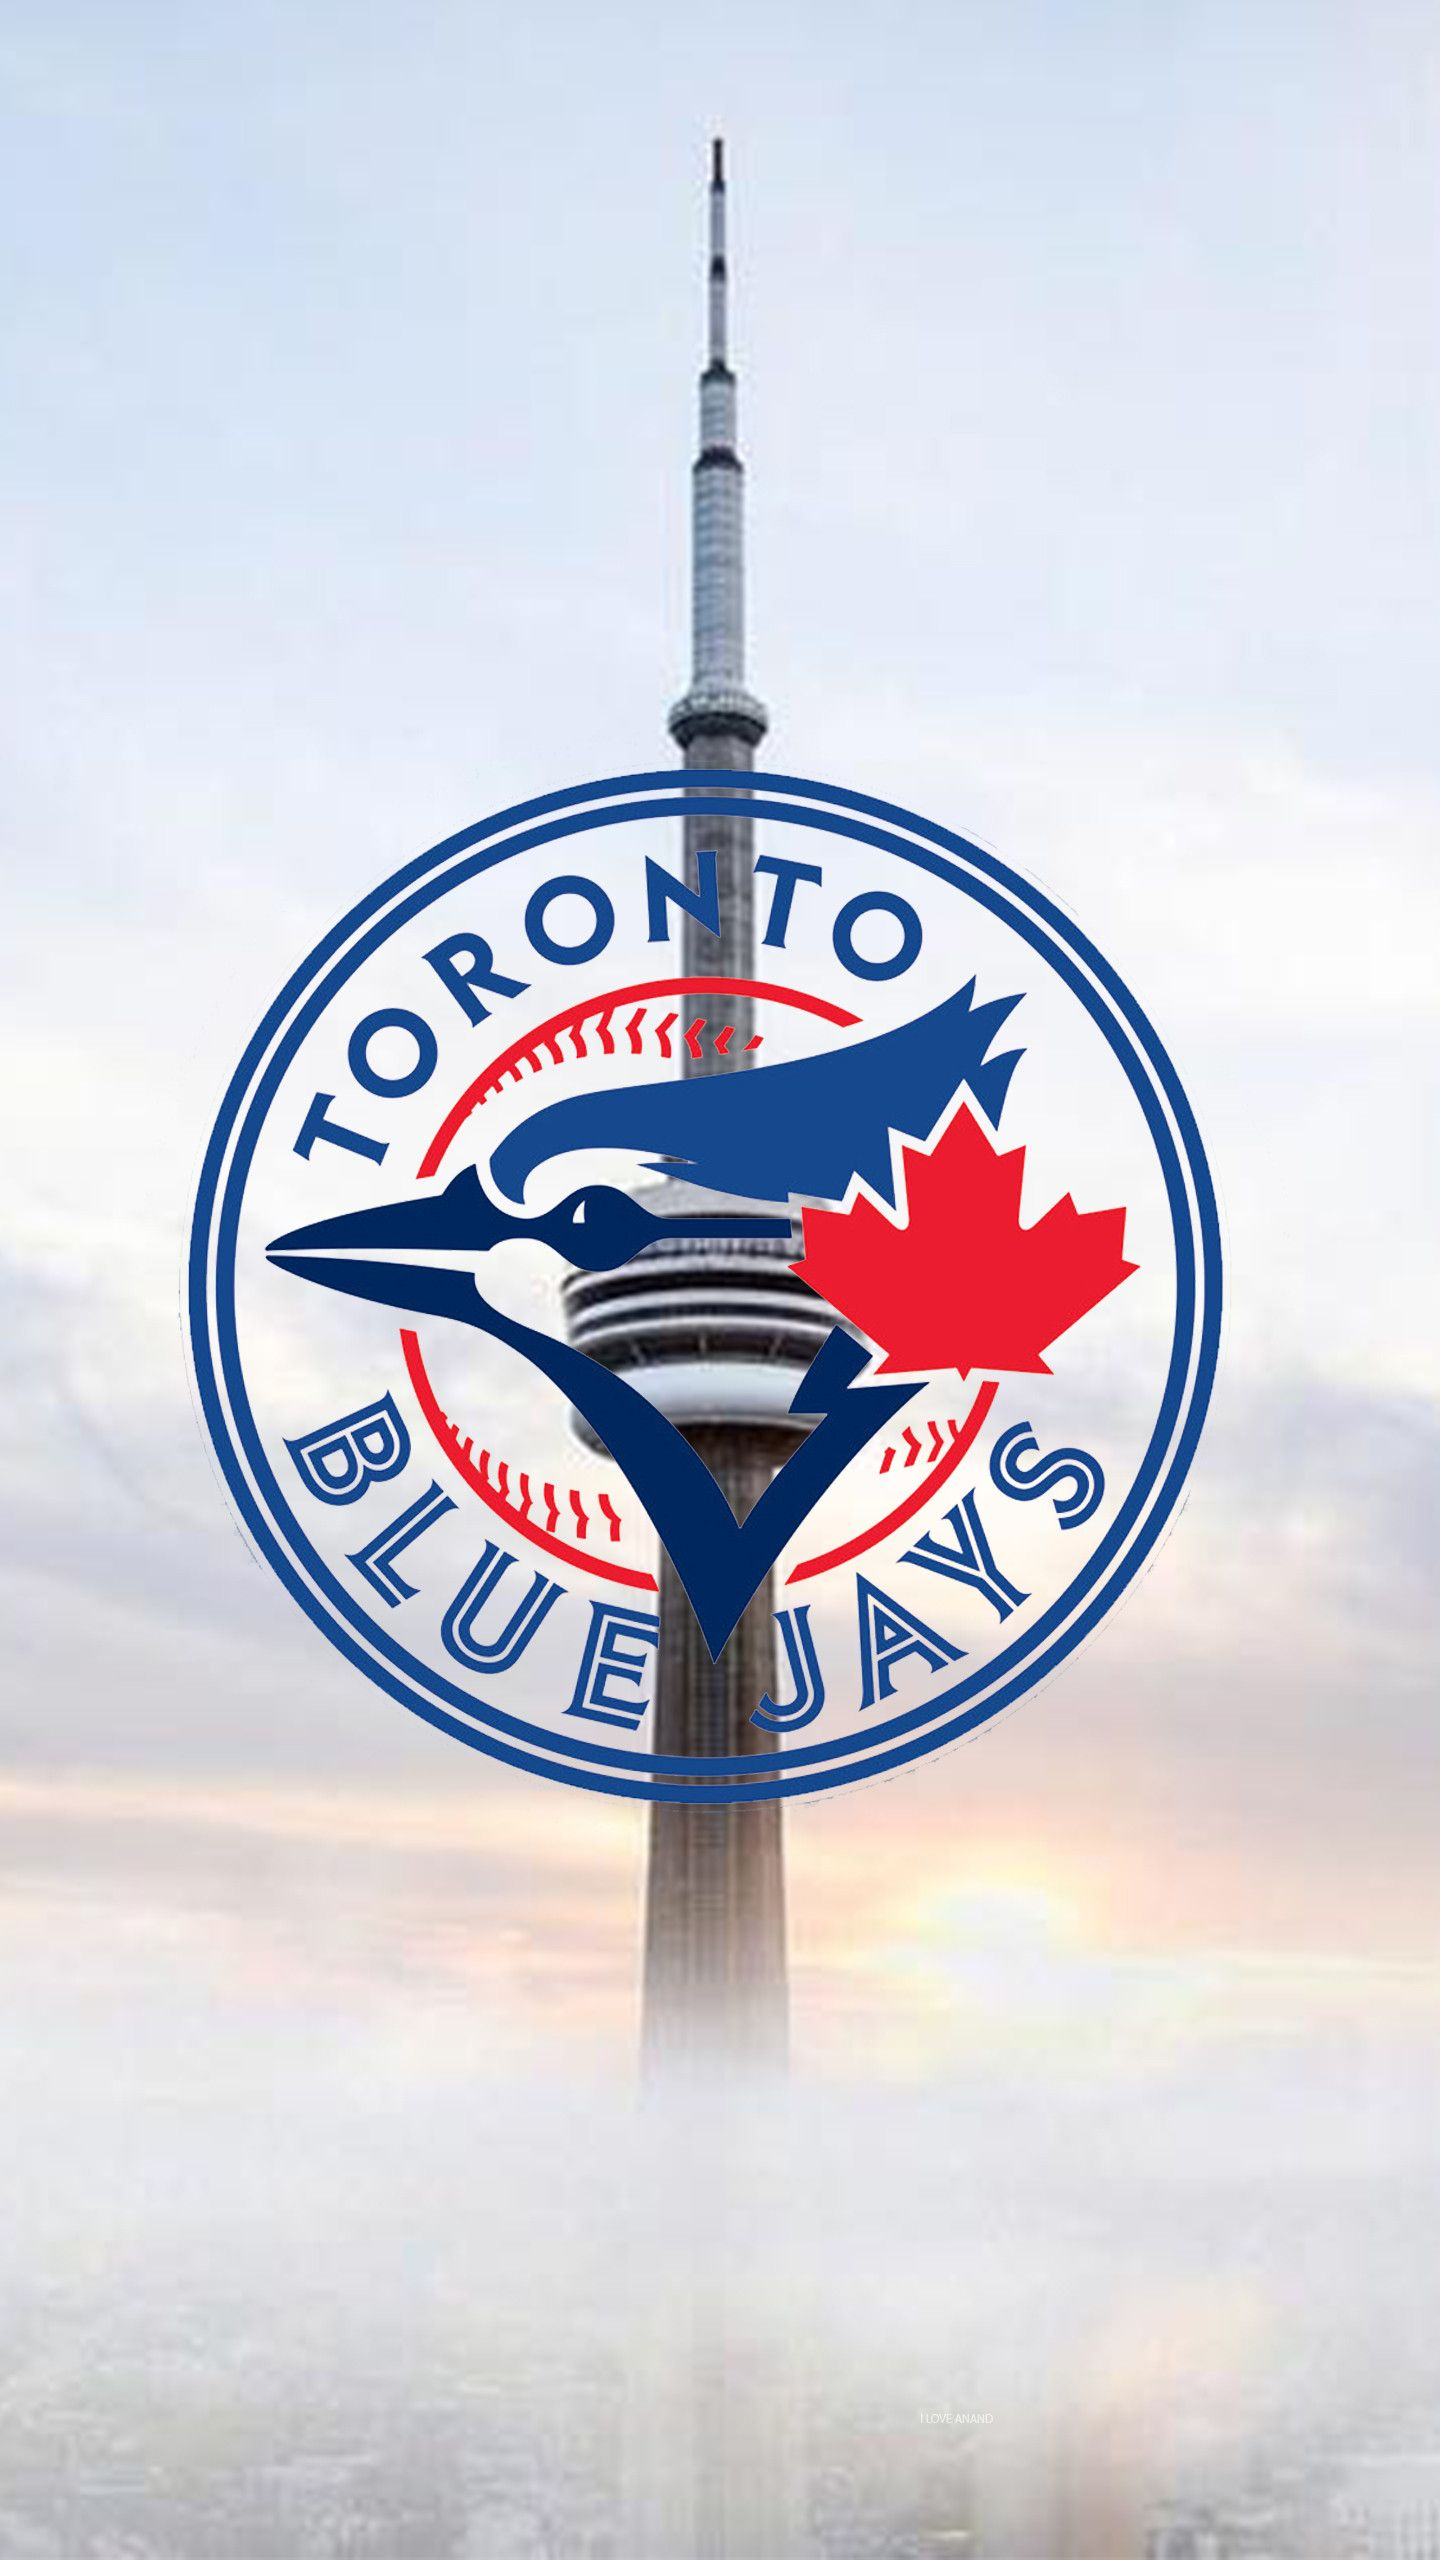 Toronto Blue Jays New , HD Wallpaper & Backgrounds